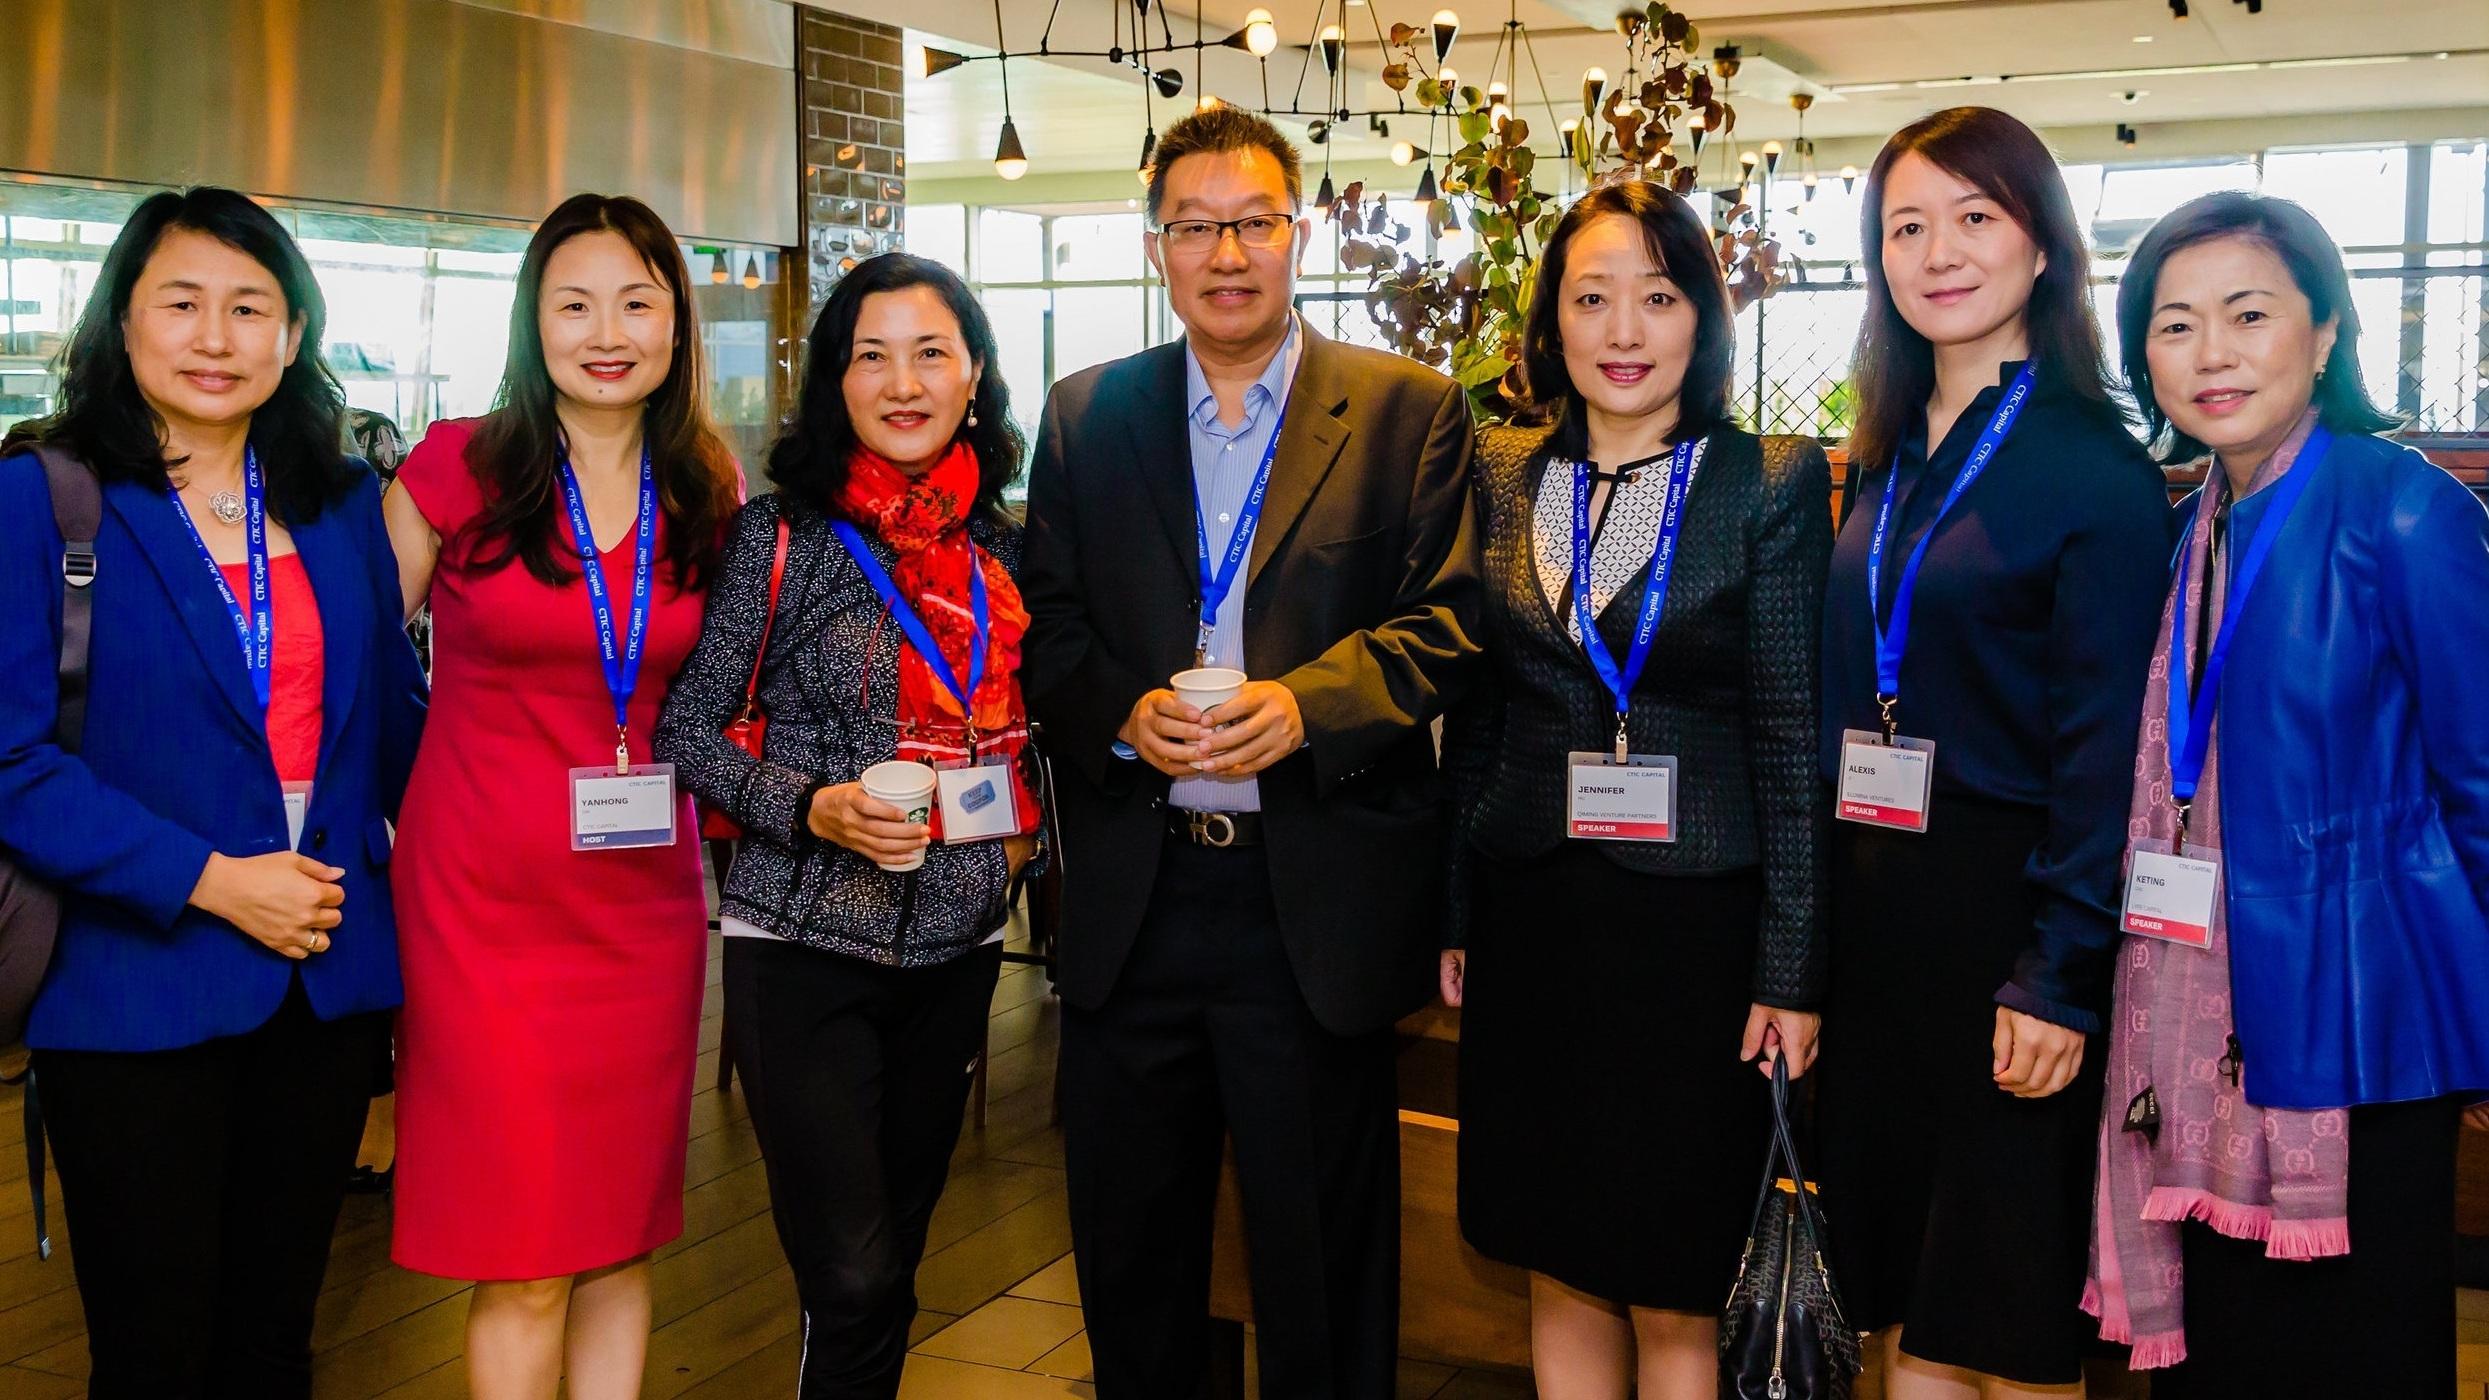 CTIC Healthcare Symposium - September 30, 2018 @ San Francisco